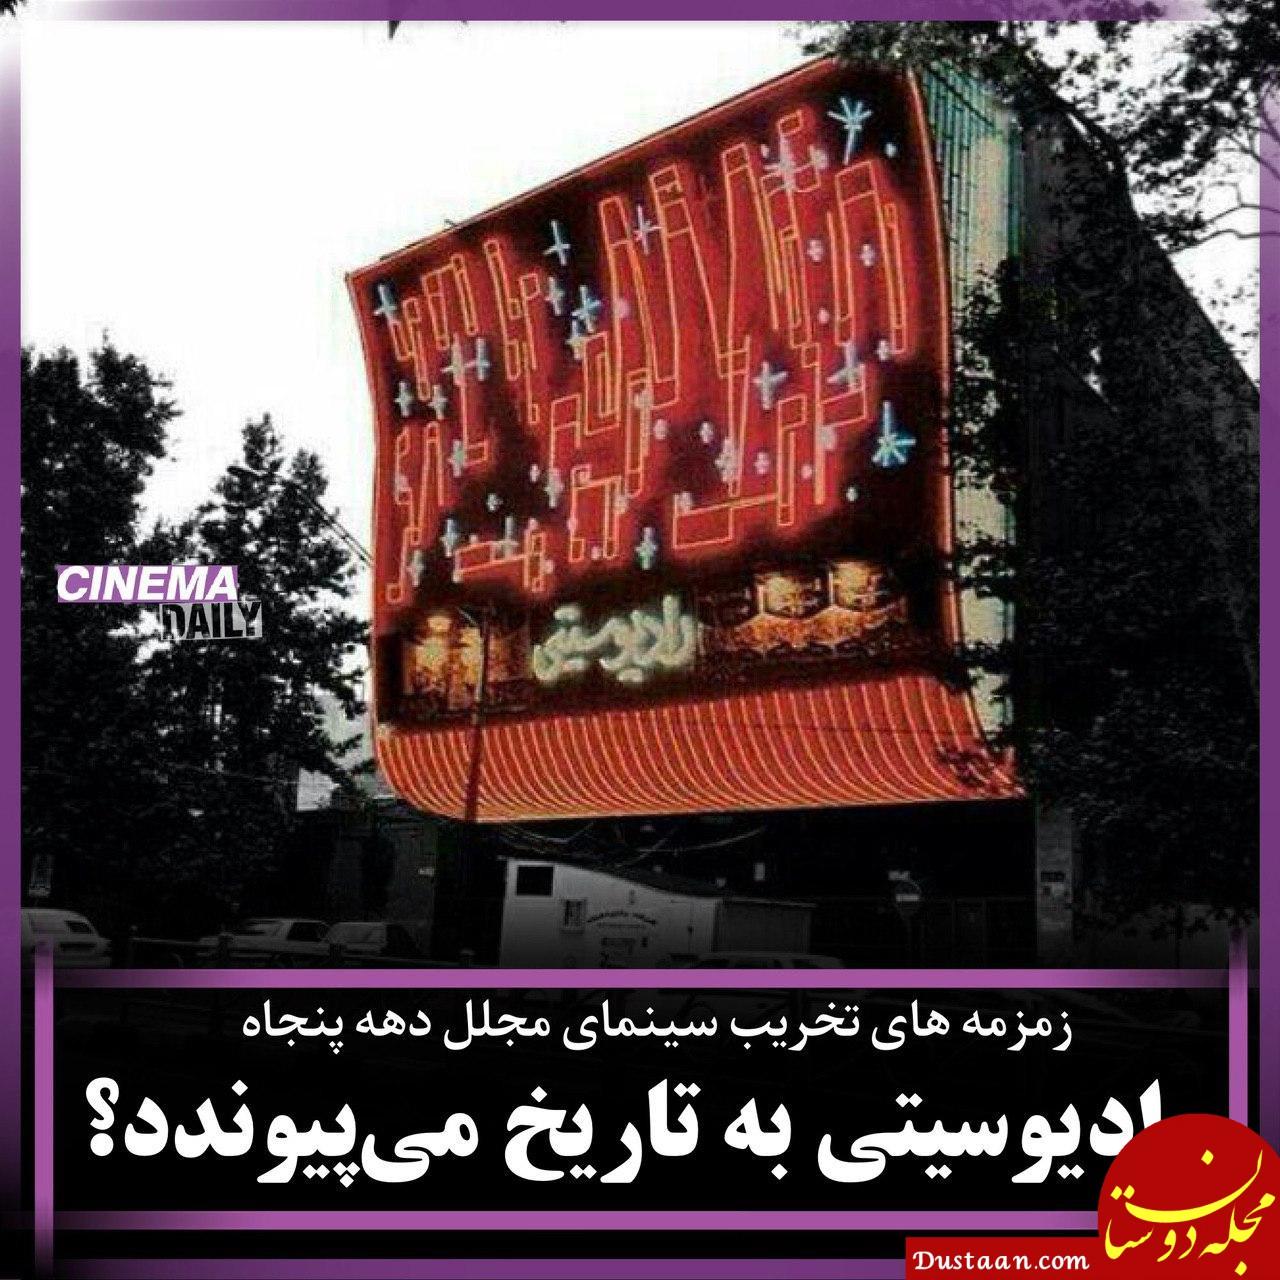 www.dustaan.com زمزمه های تخریب سینمای مجلل دهه پنجاه: رادیوسیتی به تاریخ می پیوندد